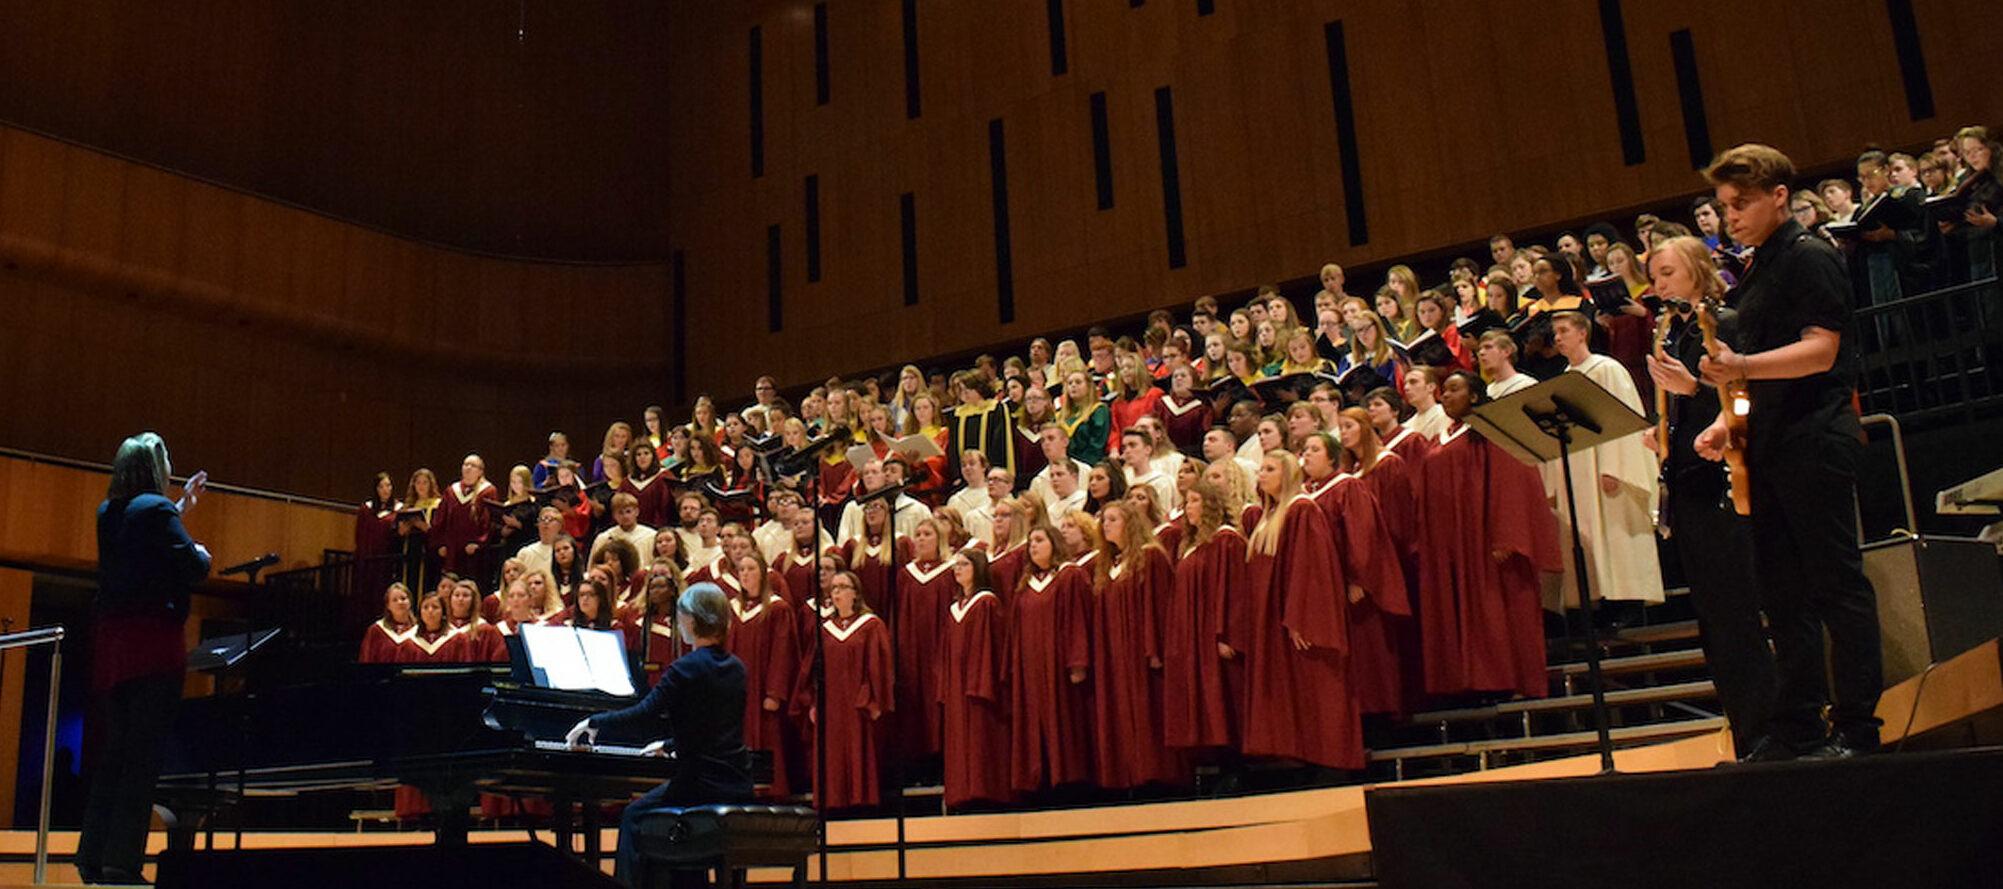 Midland University Vocal Music